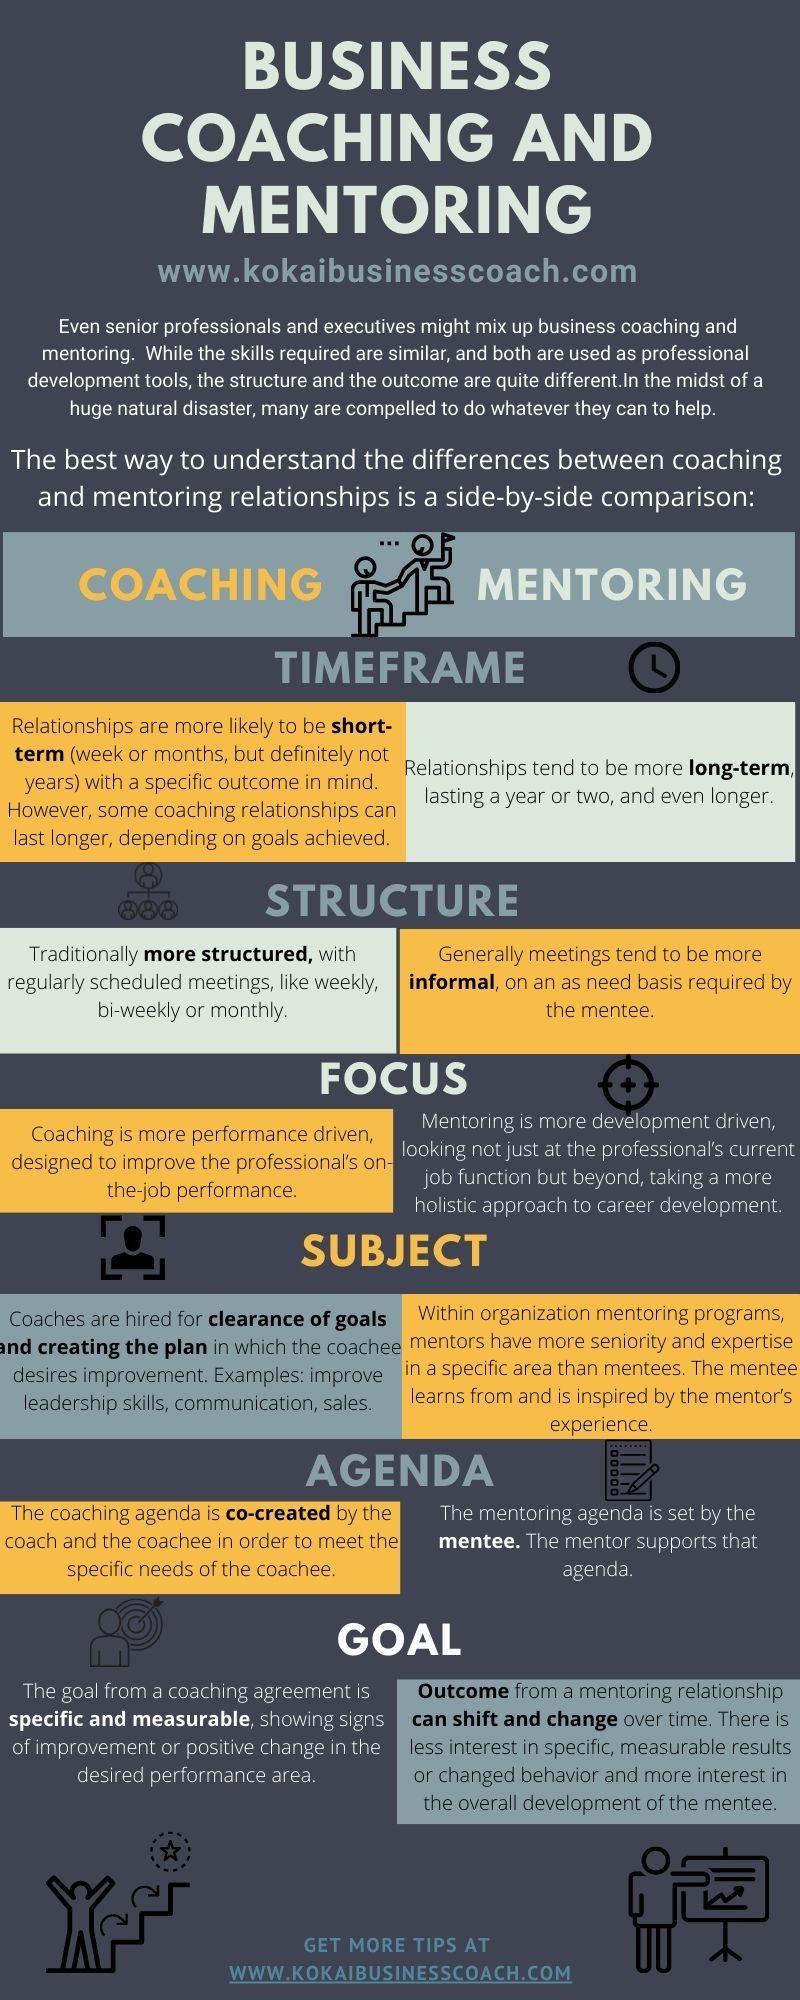 Comparing Coaching vs. Mentoring